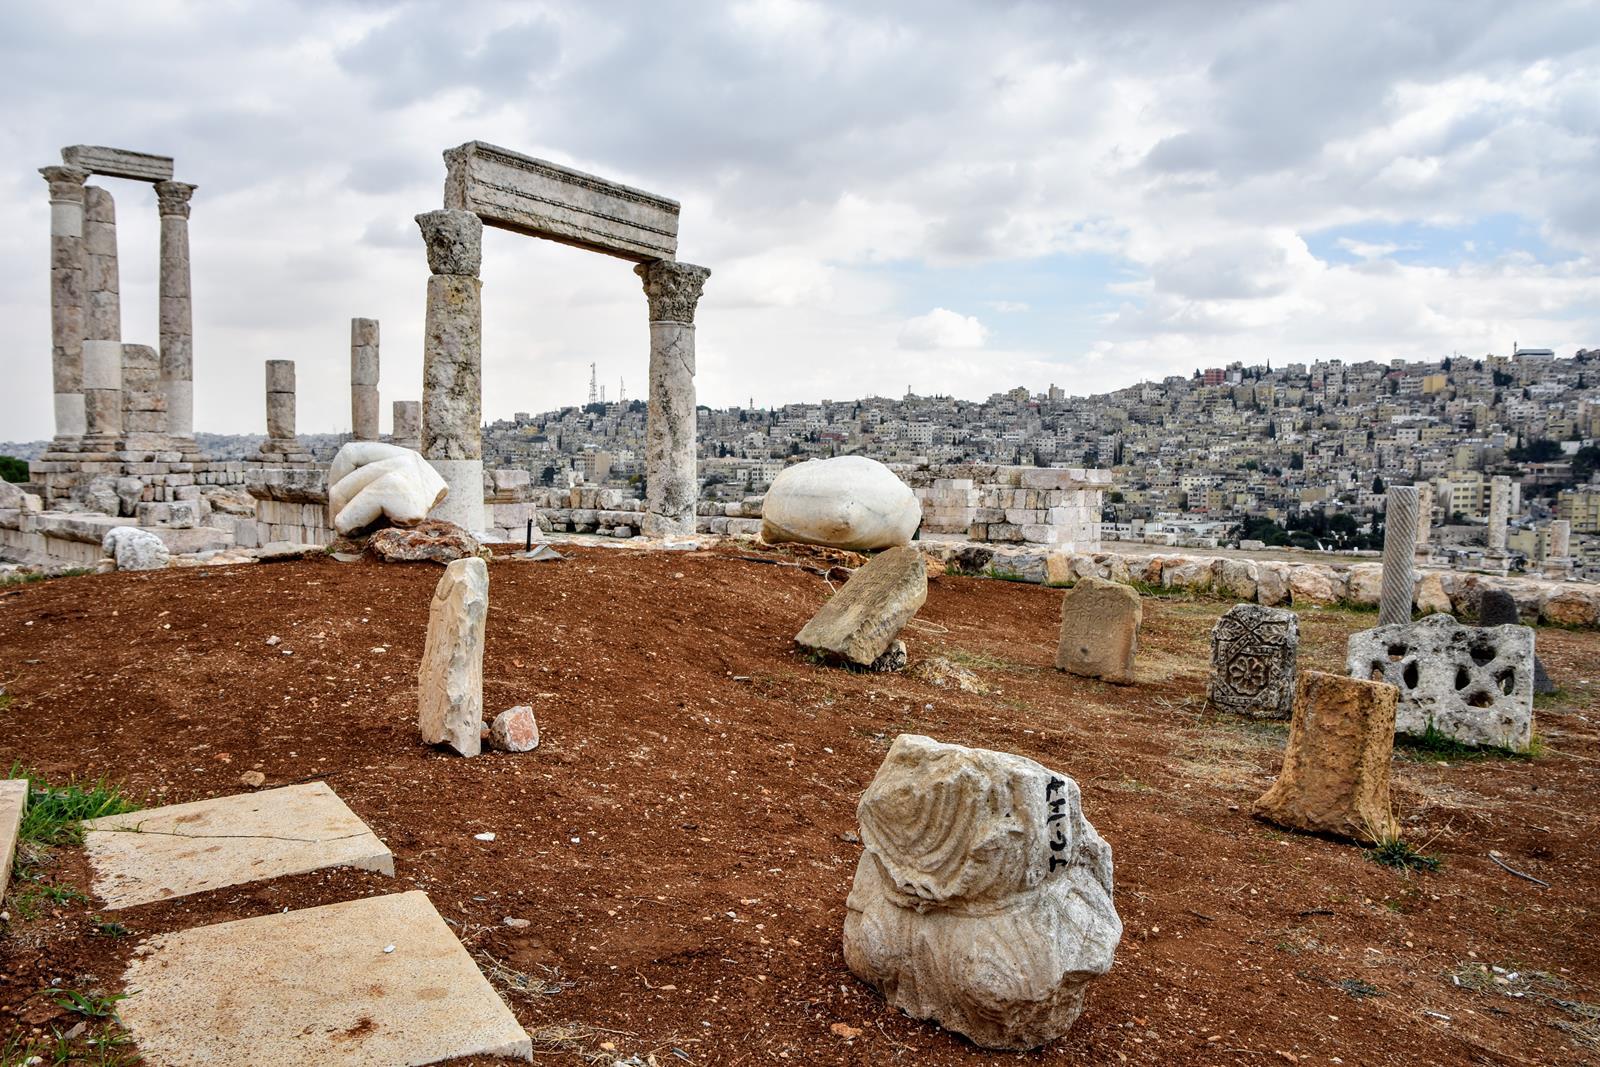 Amman (عمان, Rabbat Ammon) | Jordan (لأردن Al-Urdunn, Jordania)